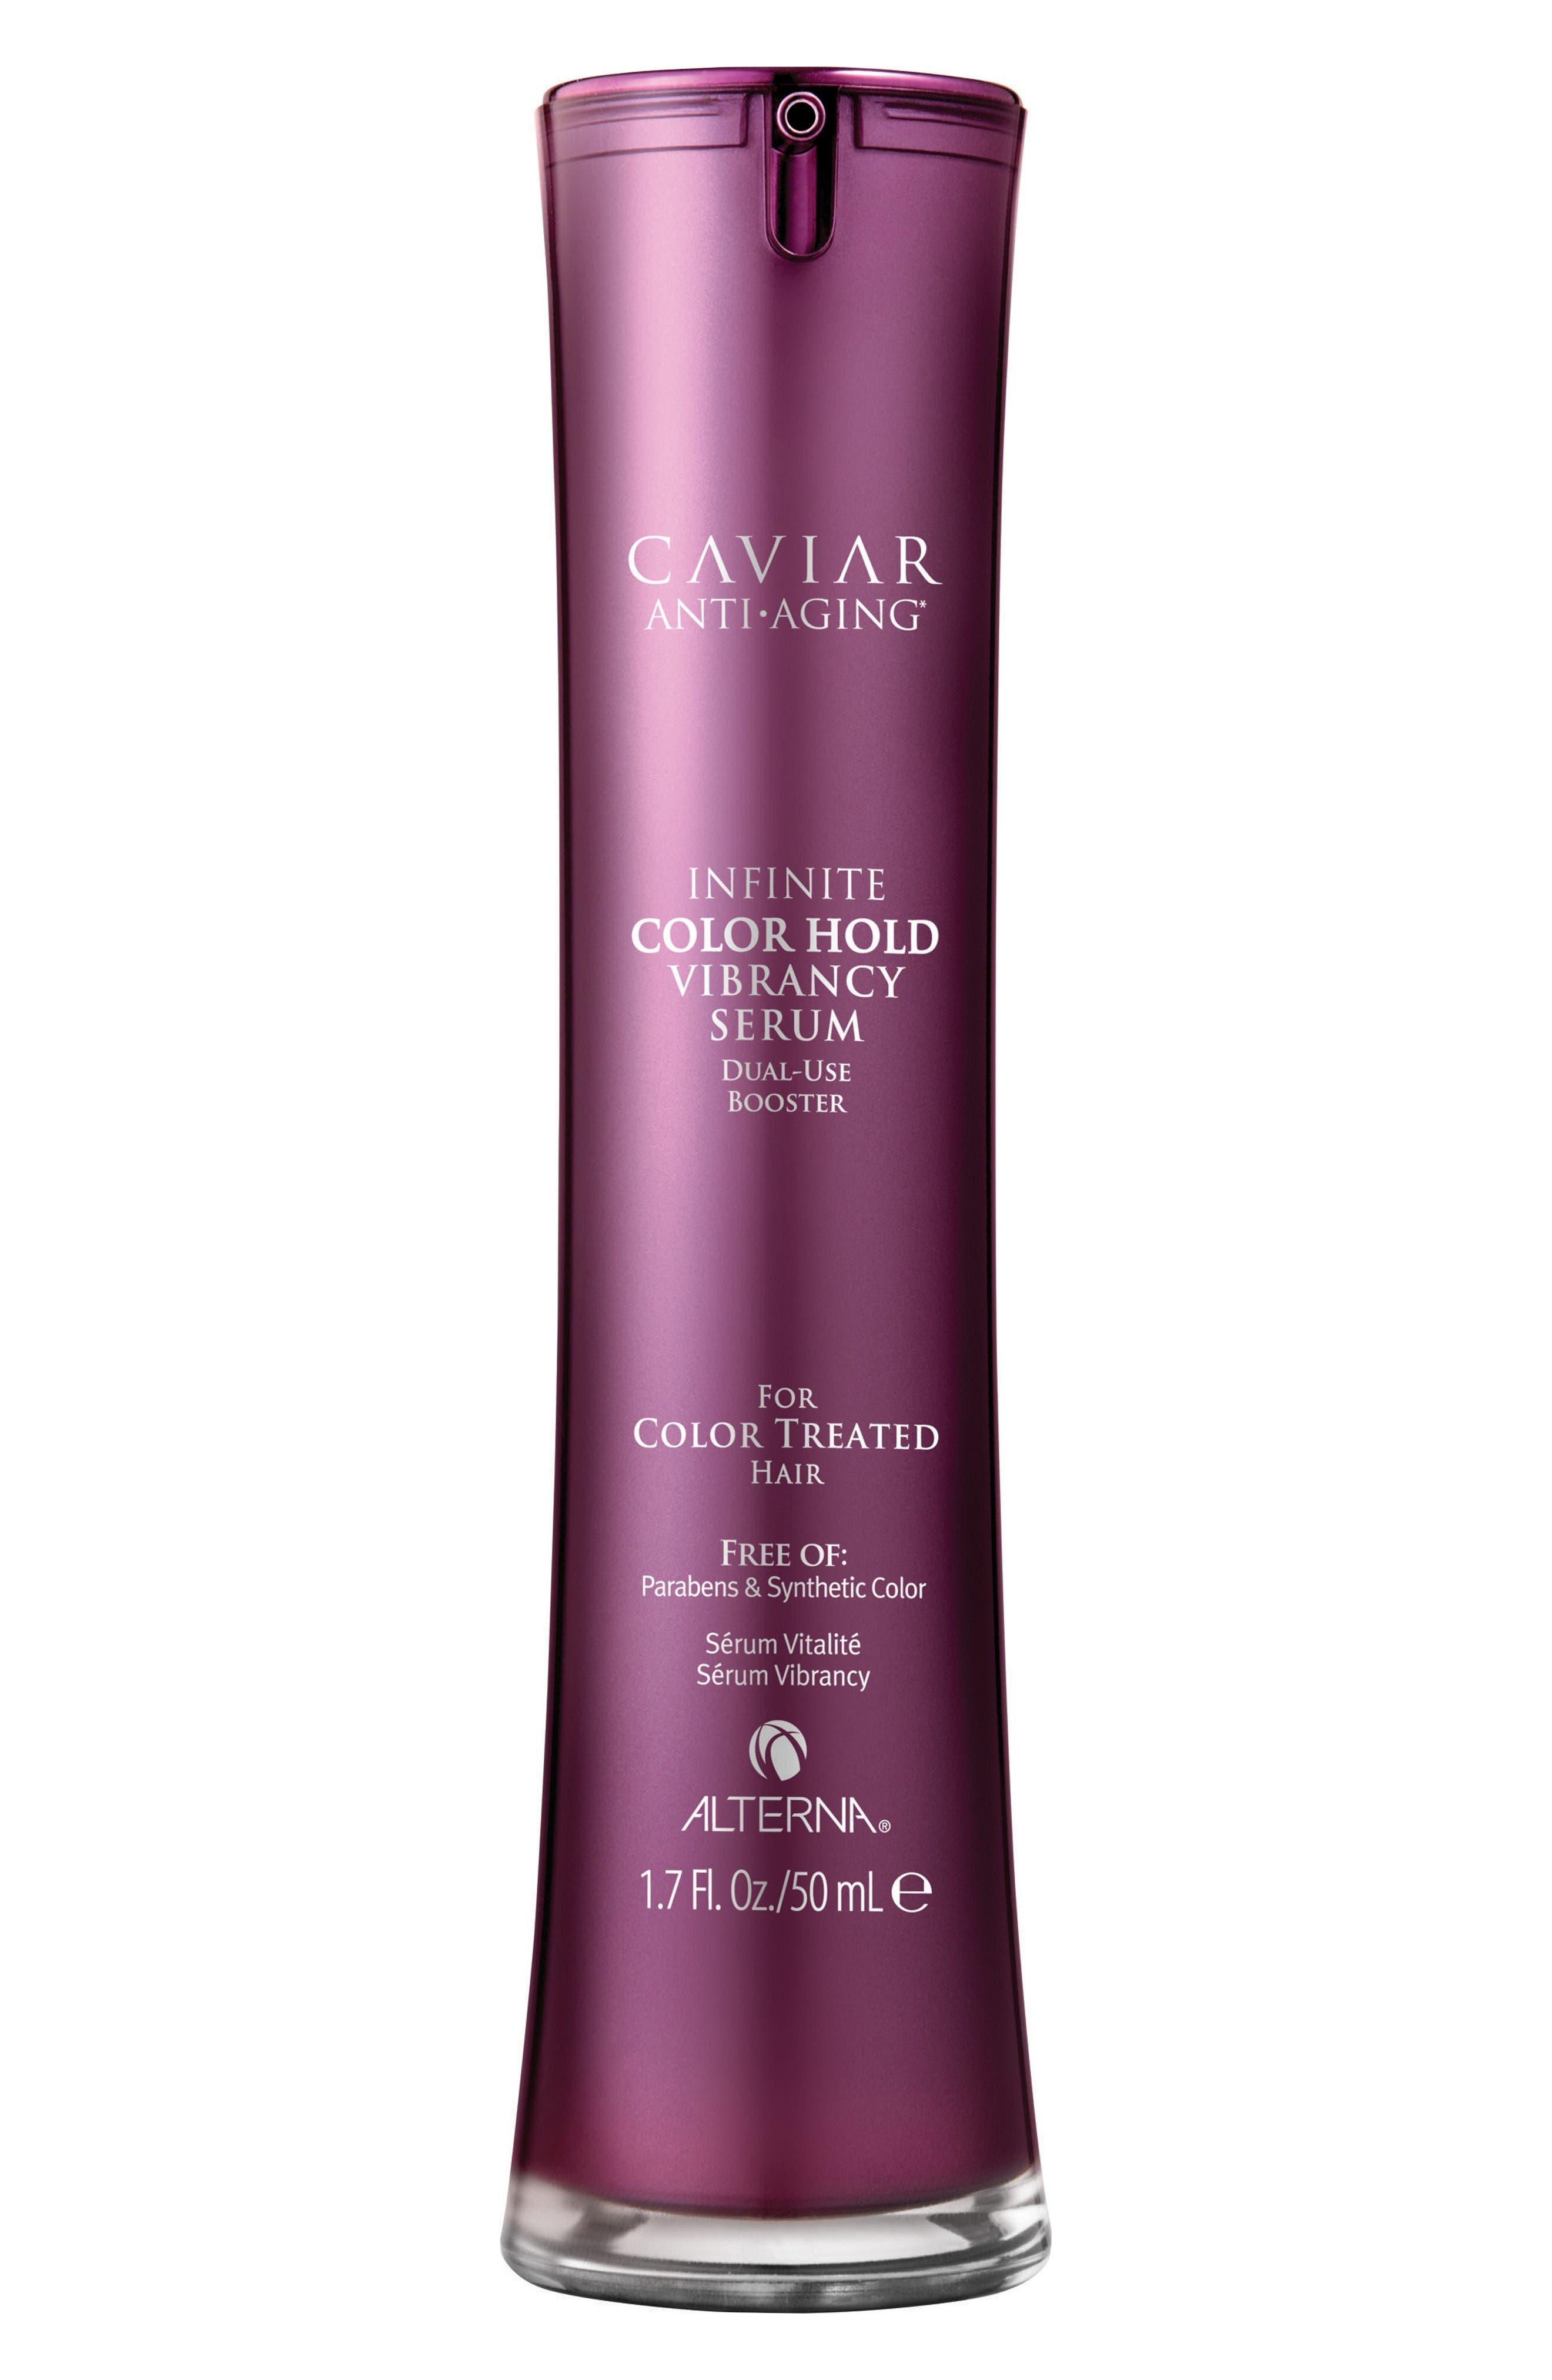 Main Image - ALTERNA® Caviar Infinite Color Hold Vibrancy Serum